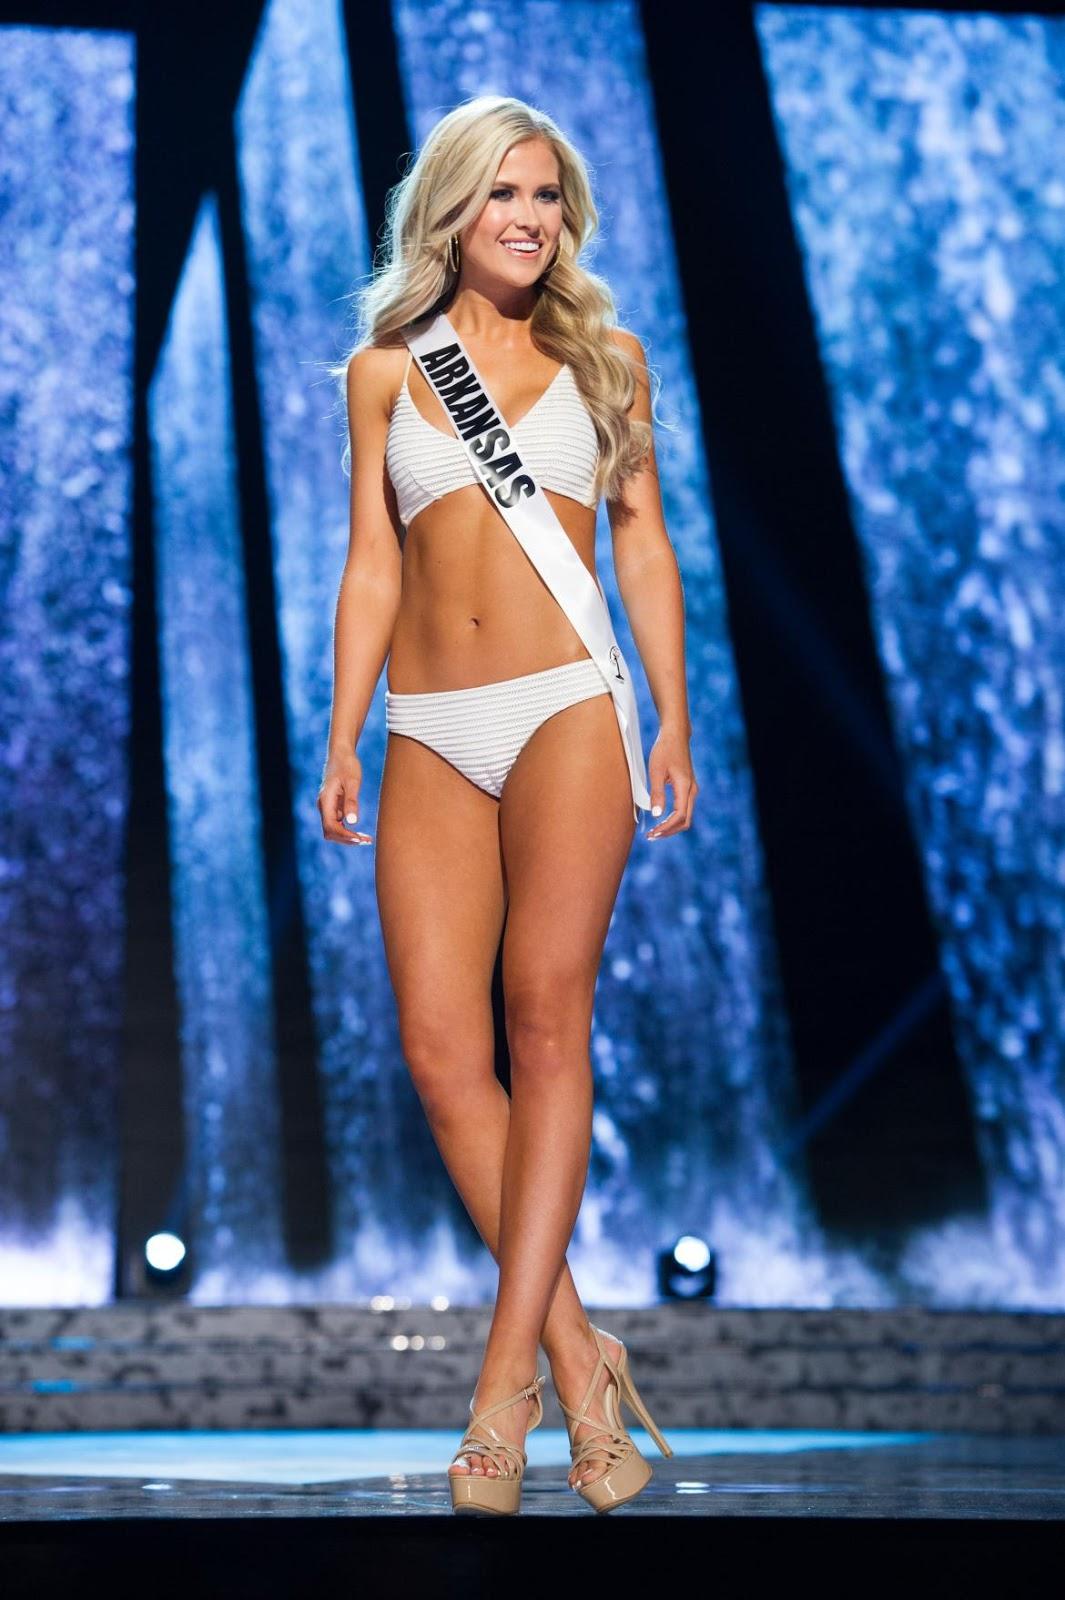 anal-tall-sexy-bikini-contestants